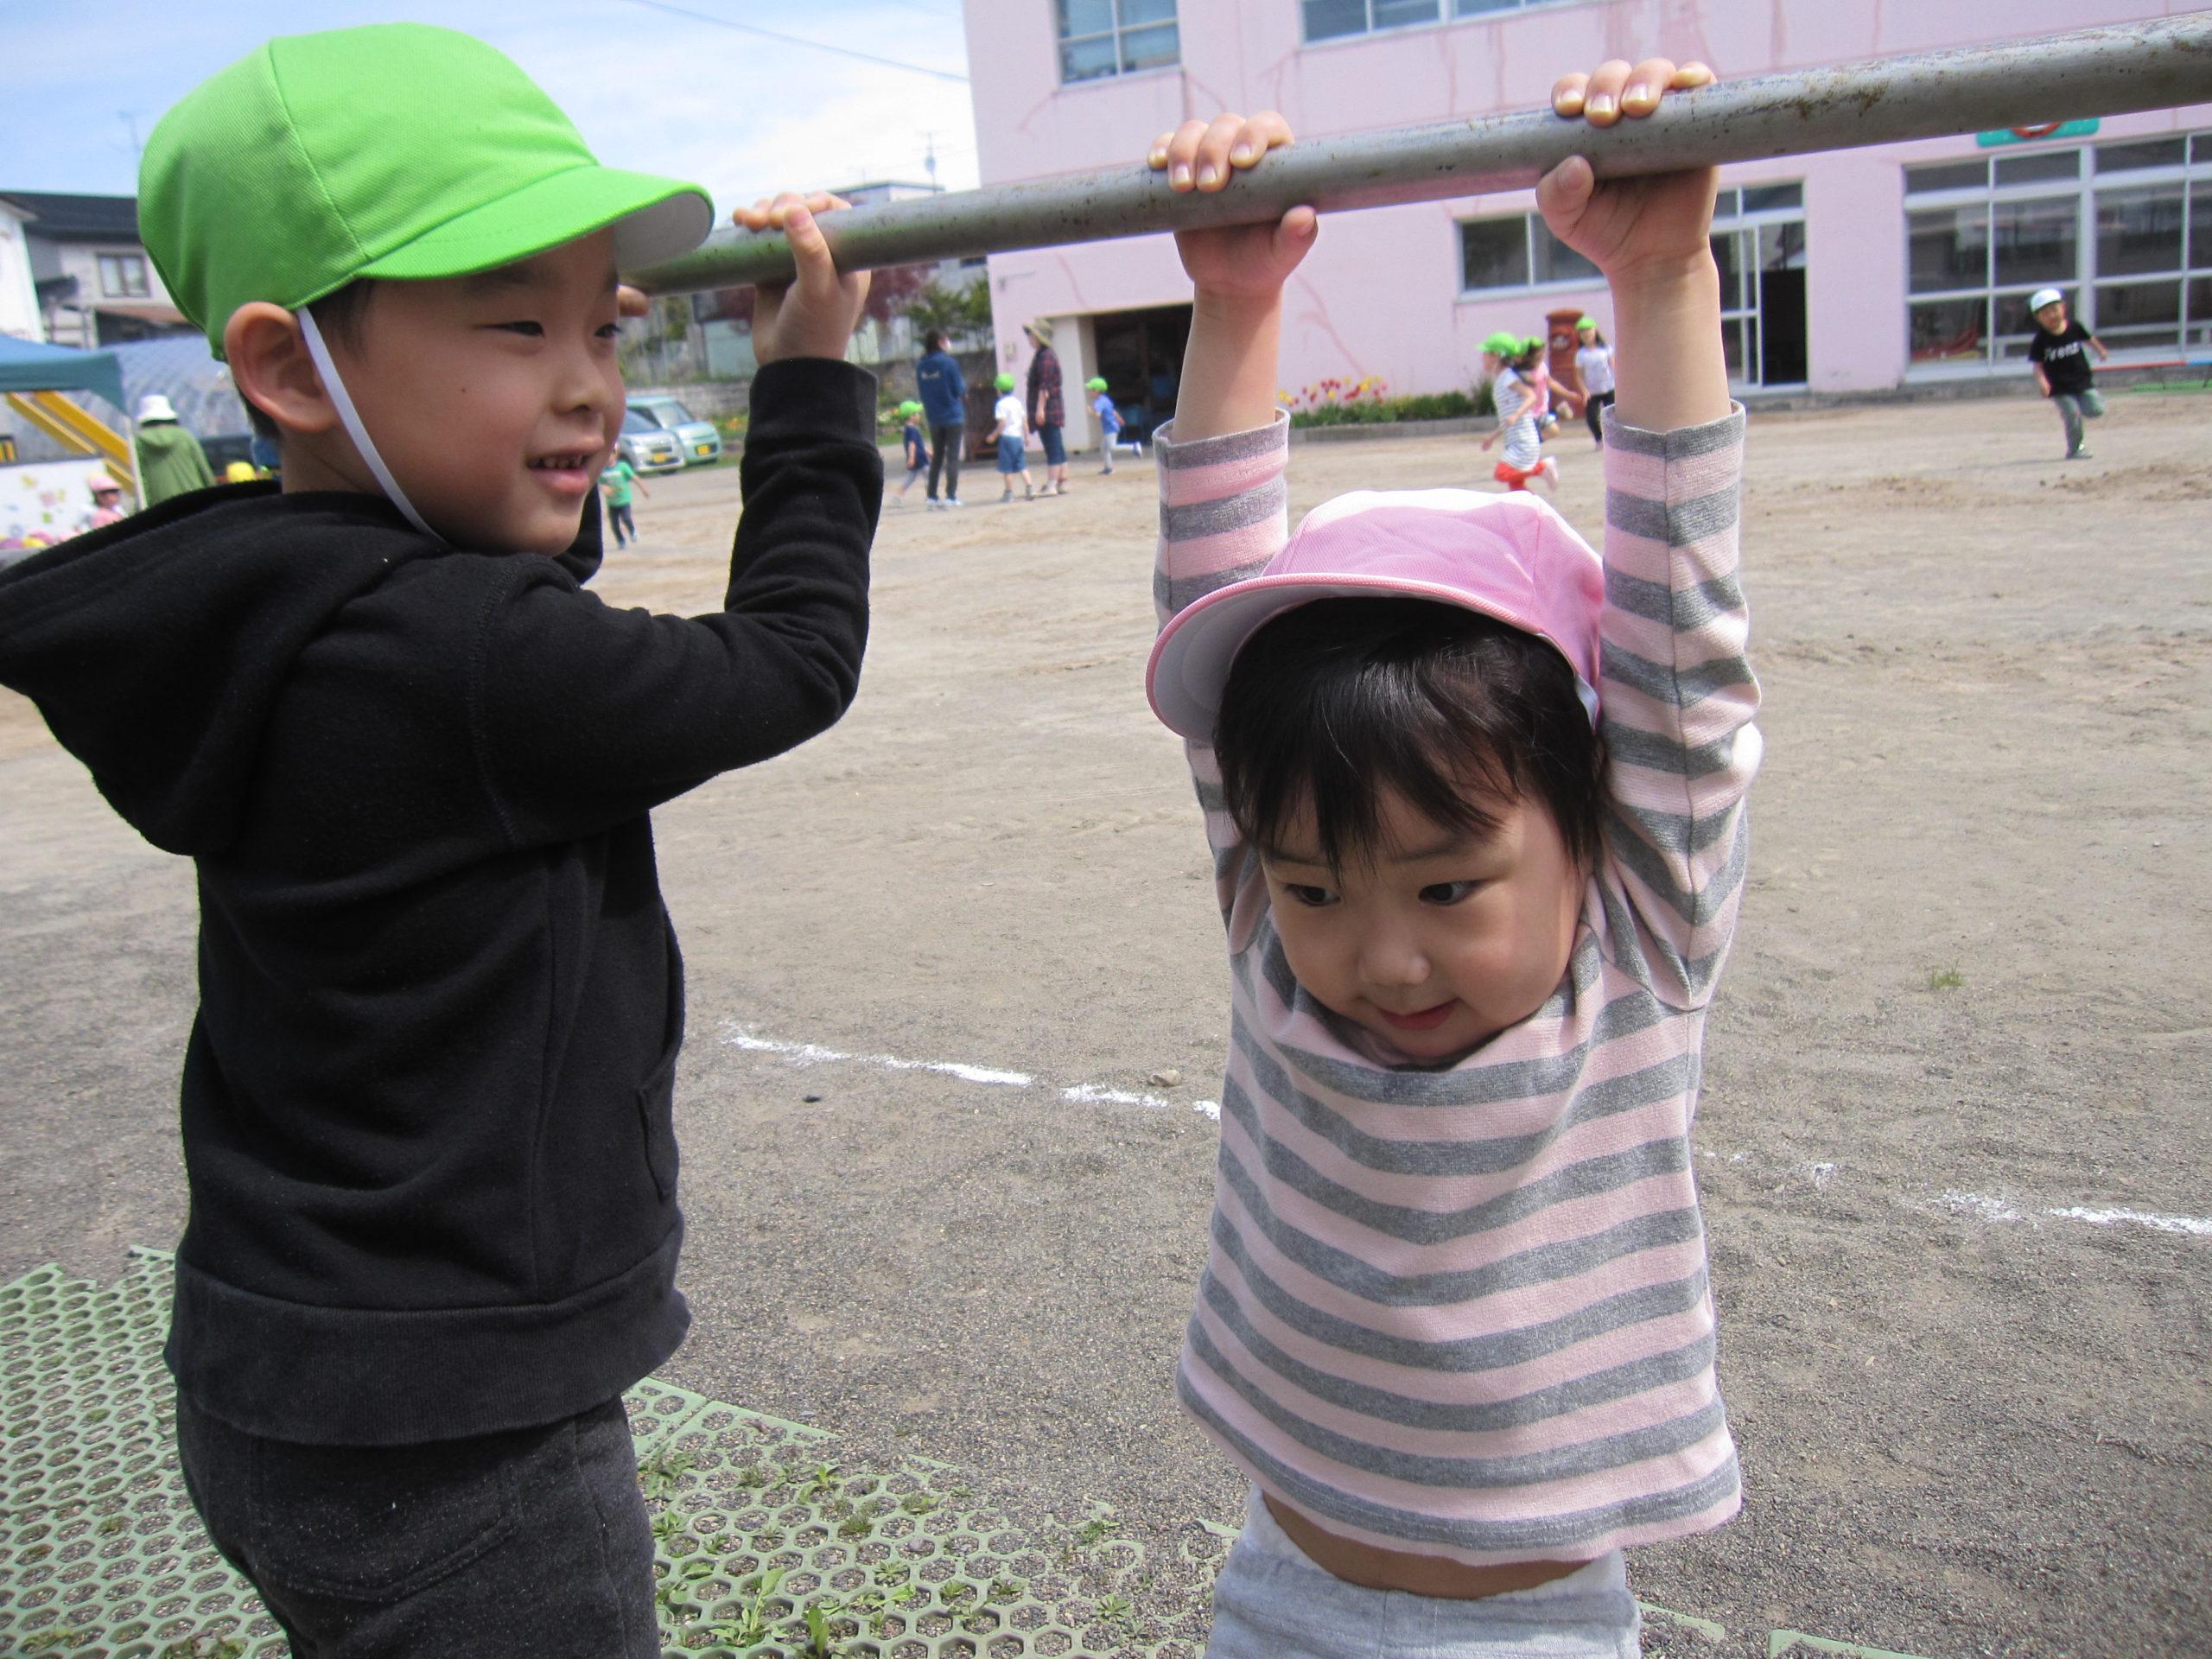 学校法人旭川カトリック学園 旭川天使幼稚園 画像3